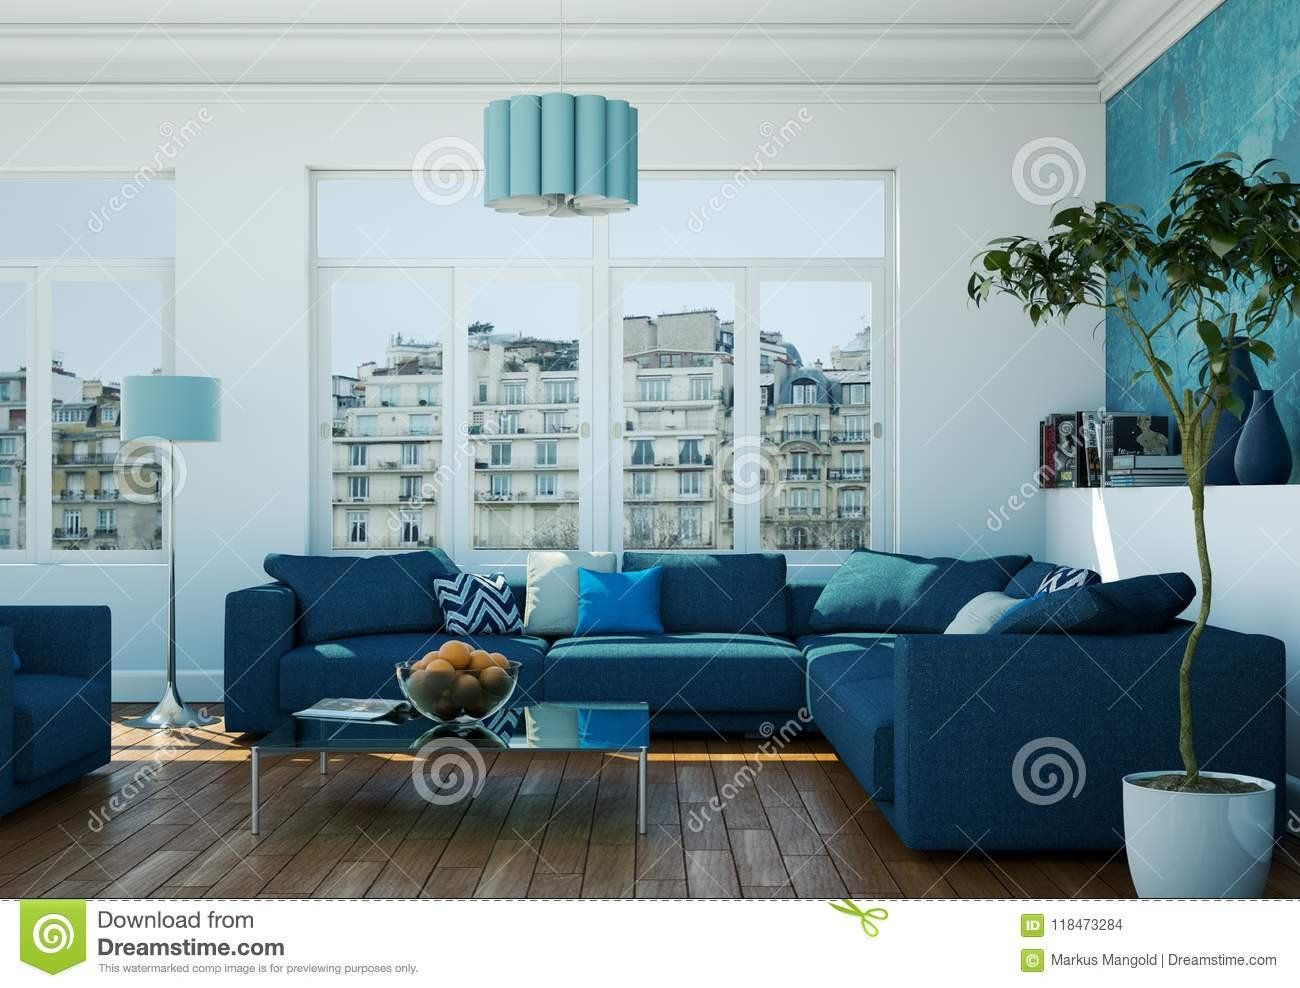 Royal Blue Dining Room Chairs Beautiful Modern Bright Living Room Interior Design With Blue Sofas Ruang Keluarga Dekorasi Ruang Keluarga Desain Kamar #royal #blue #living #room #decorating #ideas